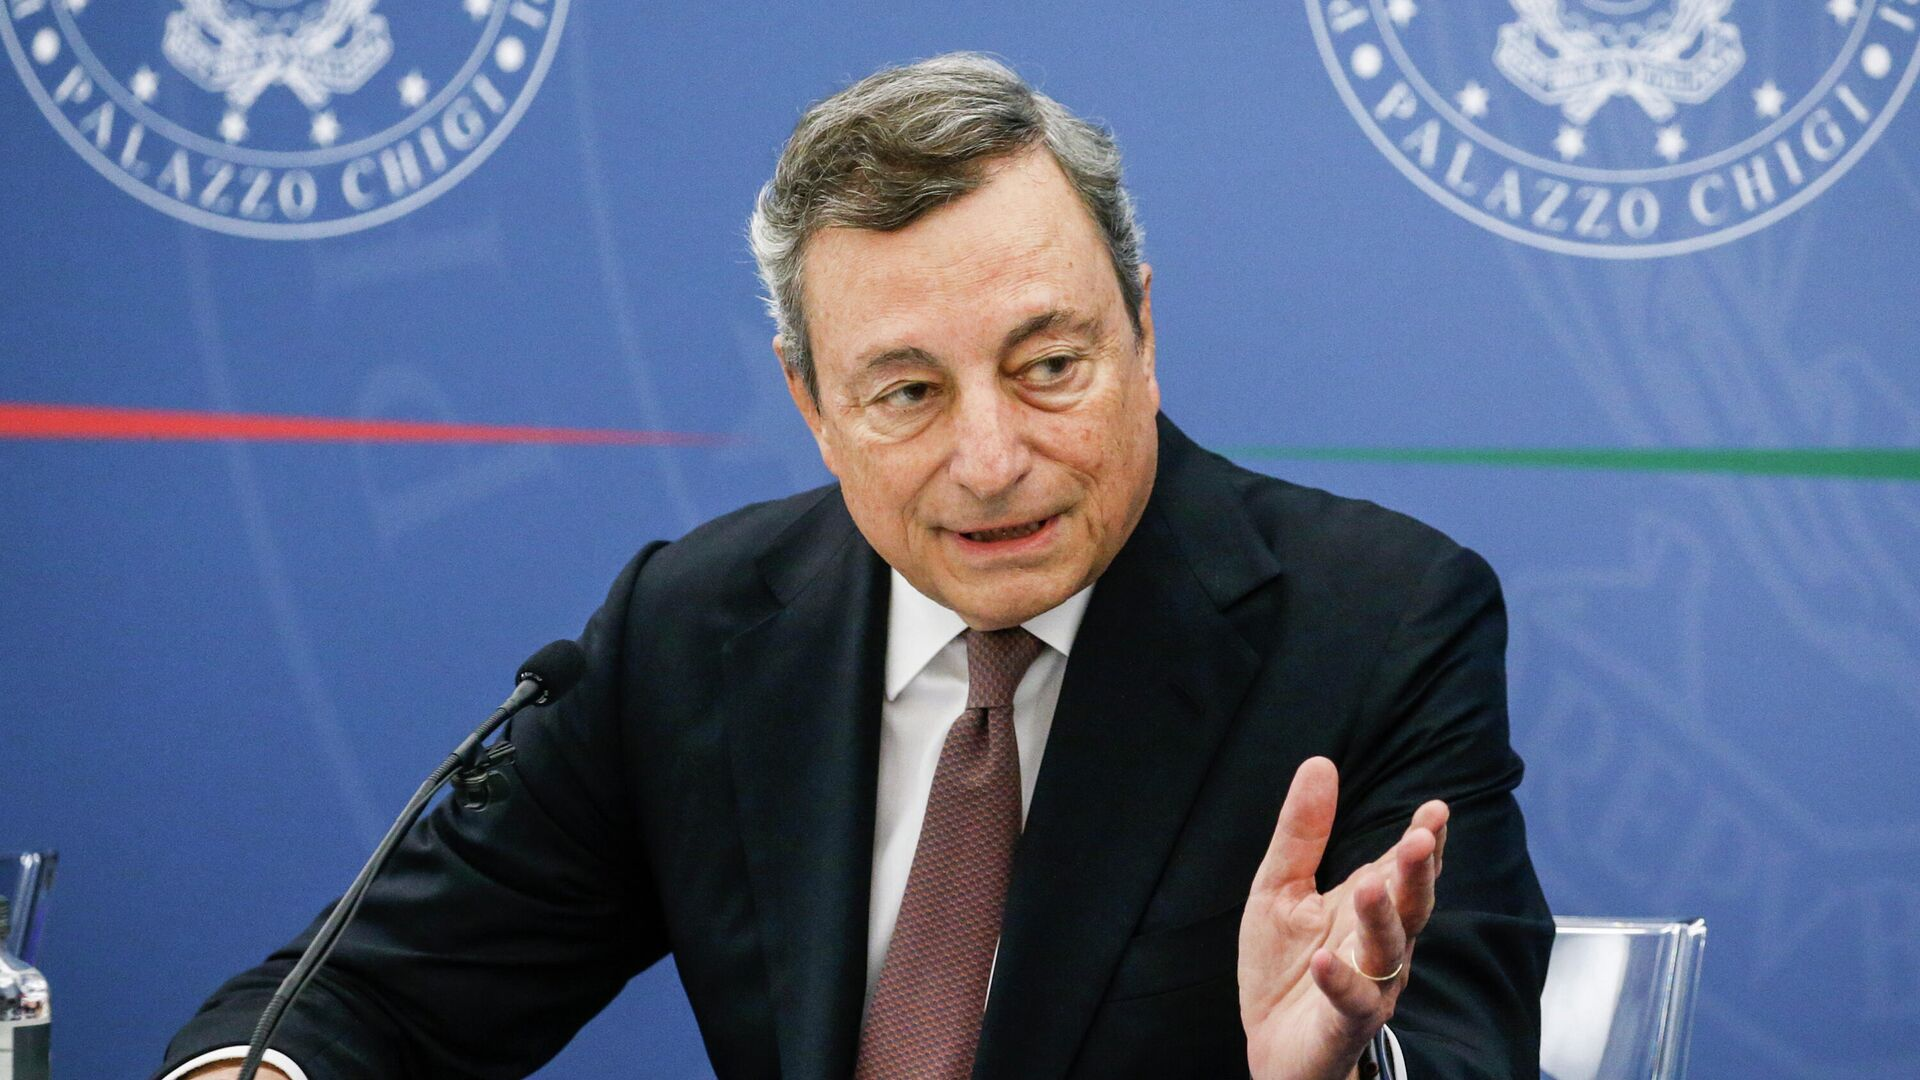 Mario Draghi, primer ministro de Italia - Sputnik Mundo, 1920, 09.09.2021